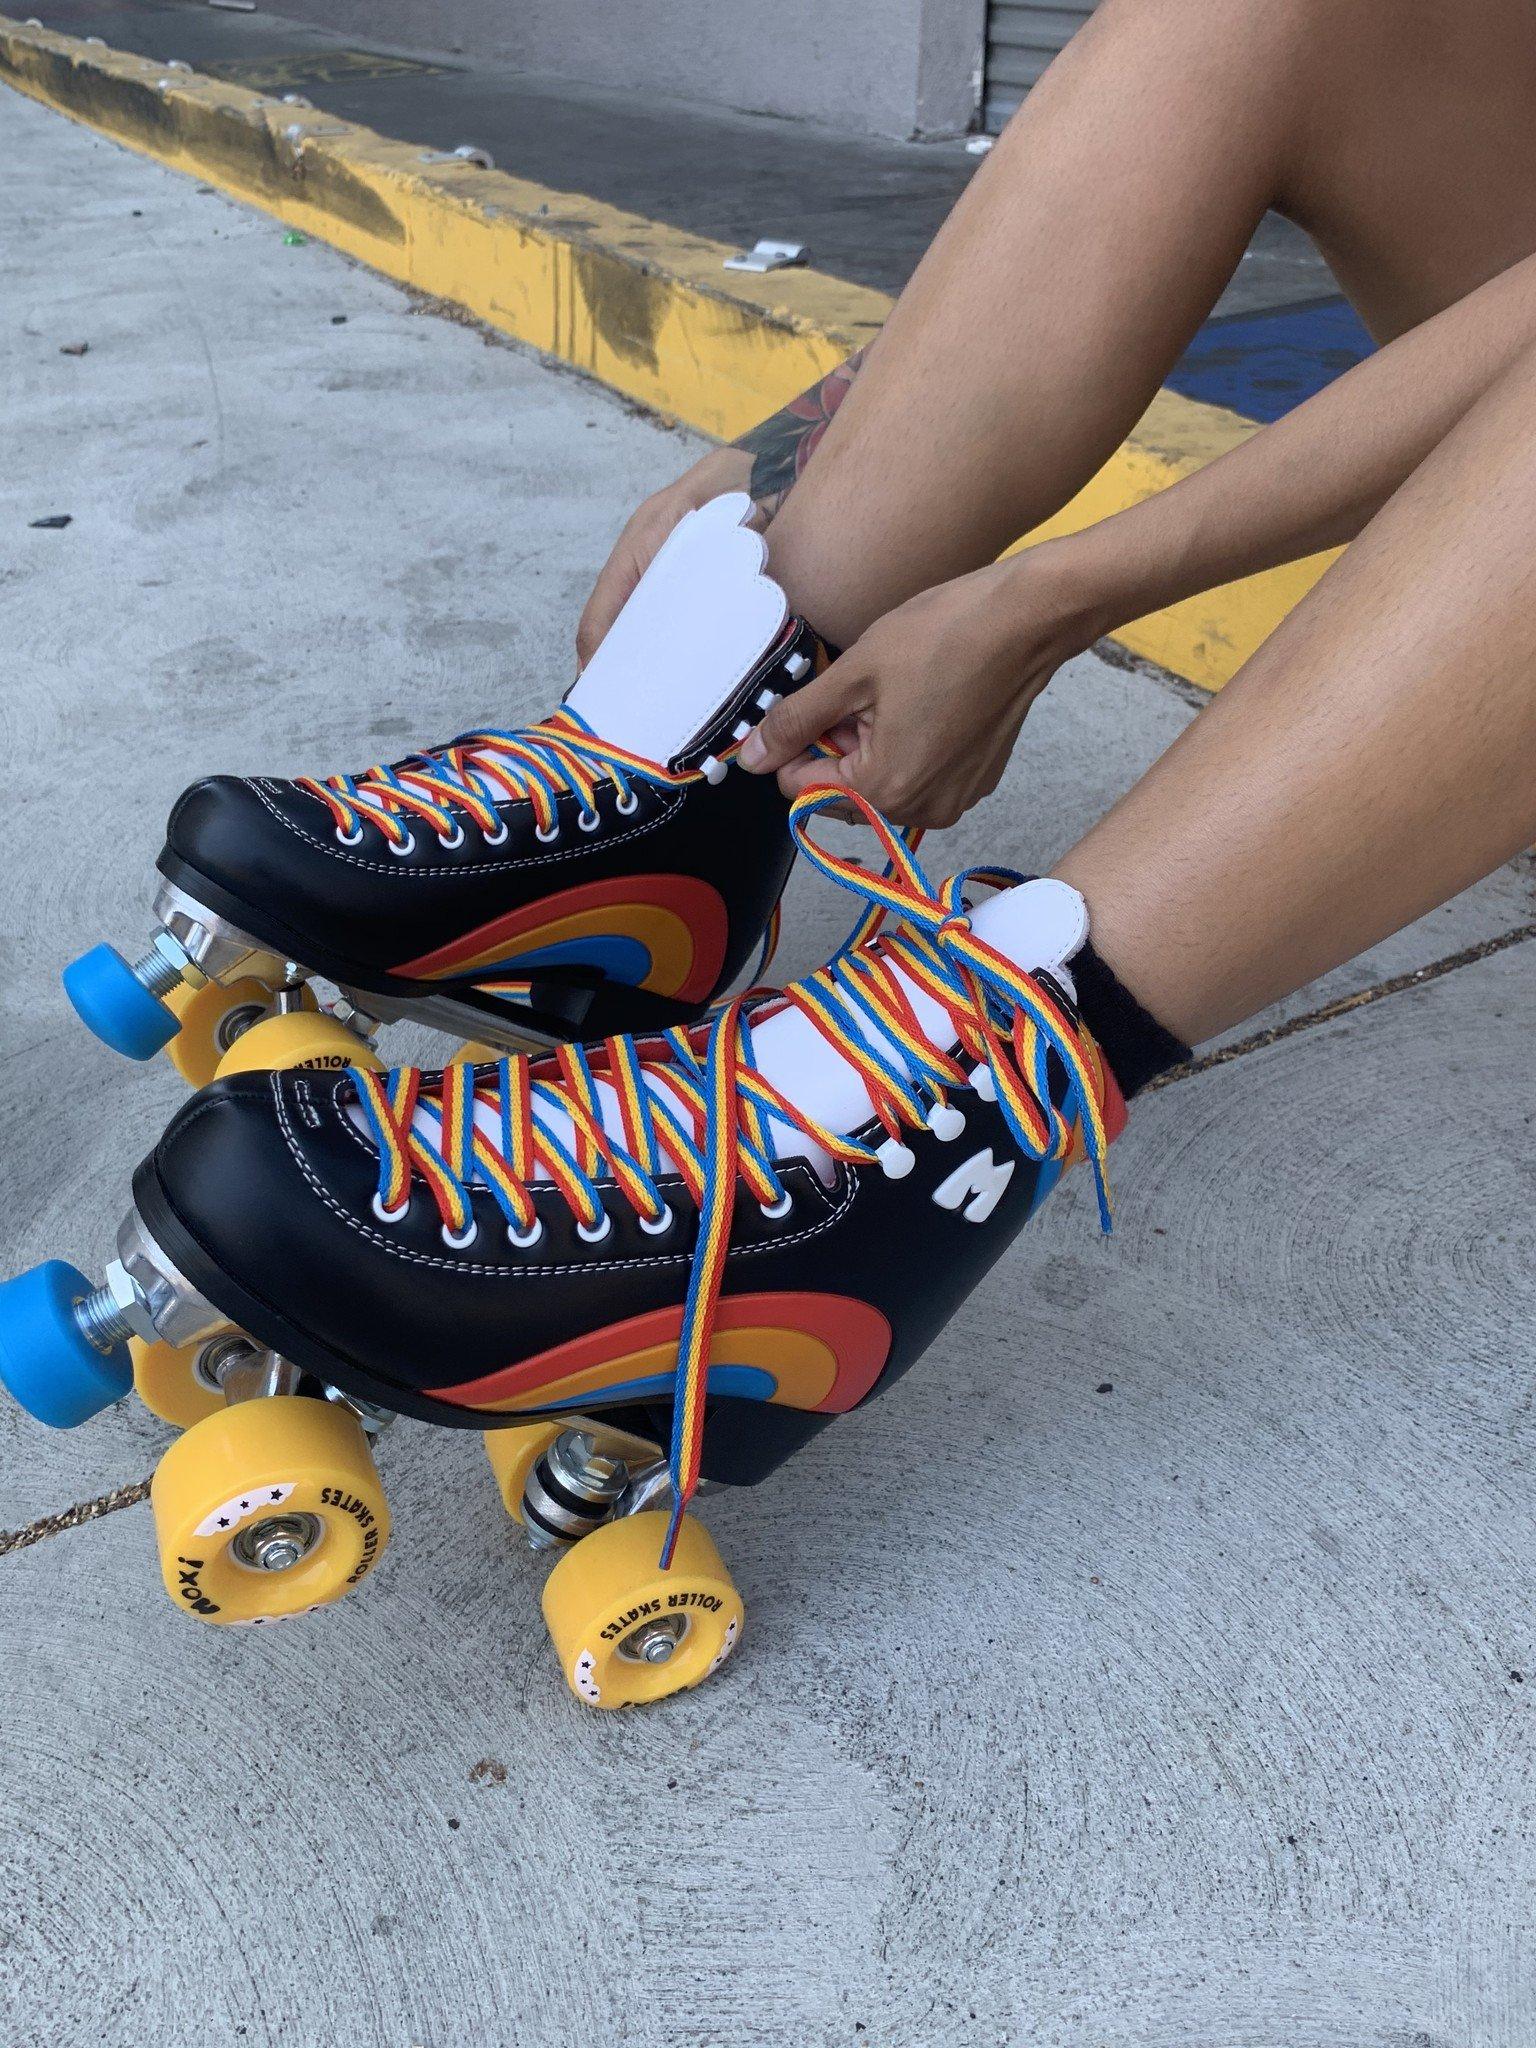 Moxi Rainbow Rider Roller Skates